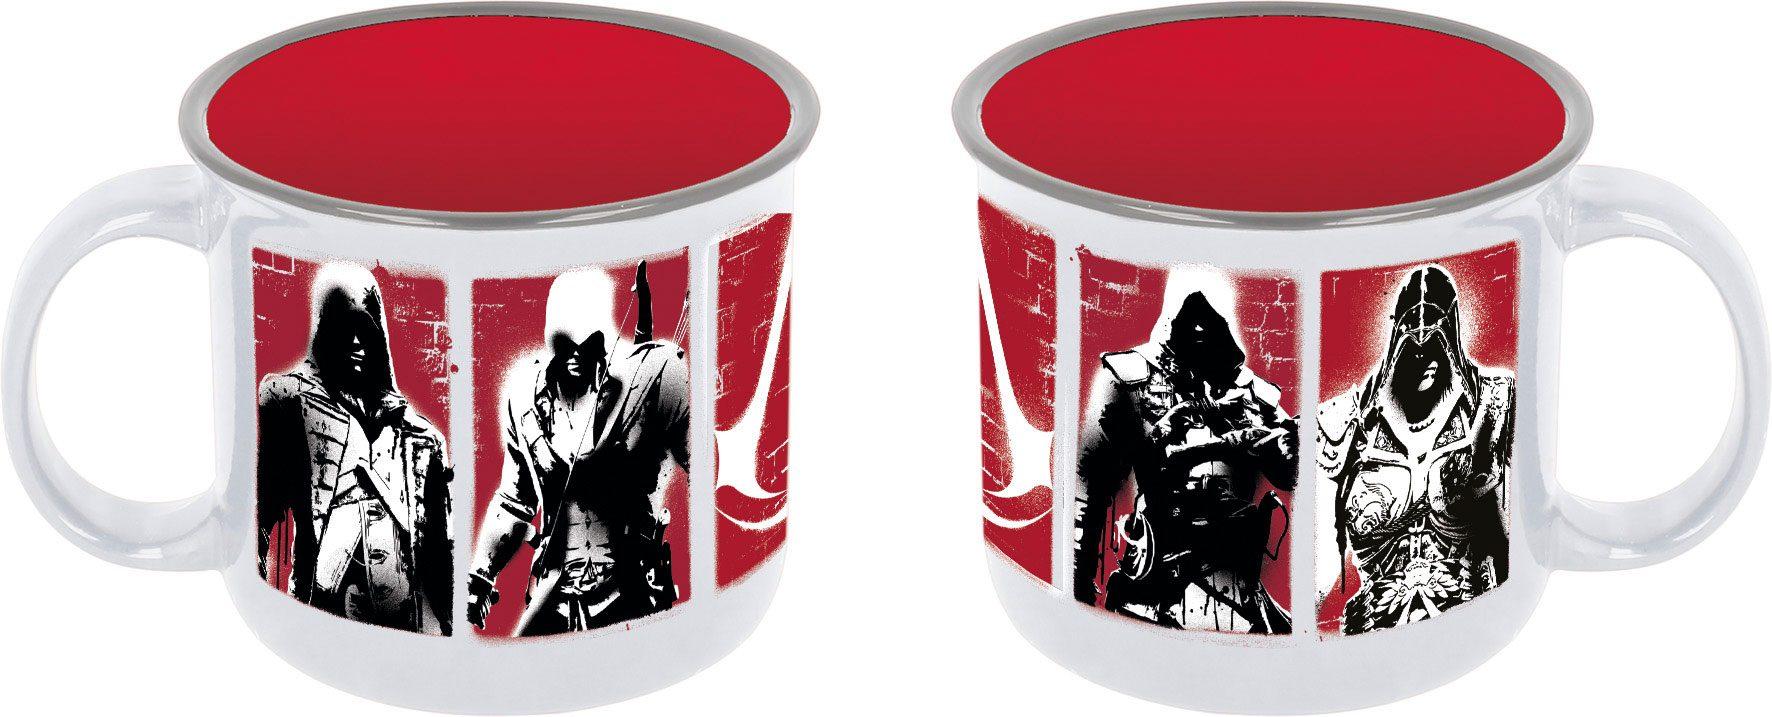 Assassin's Creed Mug Case Characters (12)